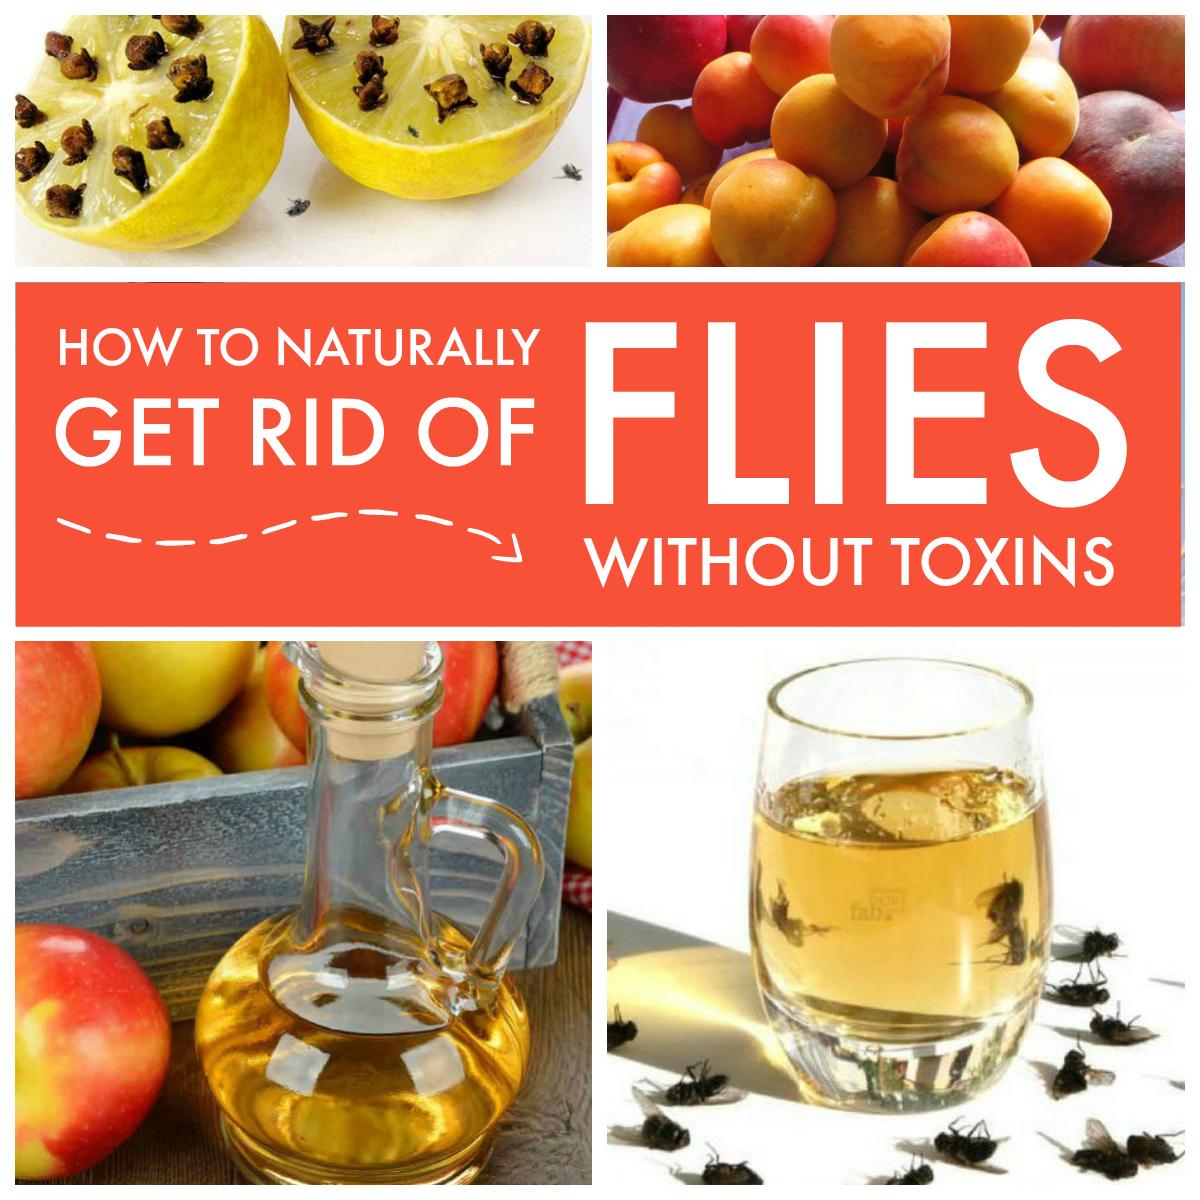 Get rid of flies naturally